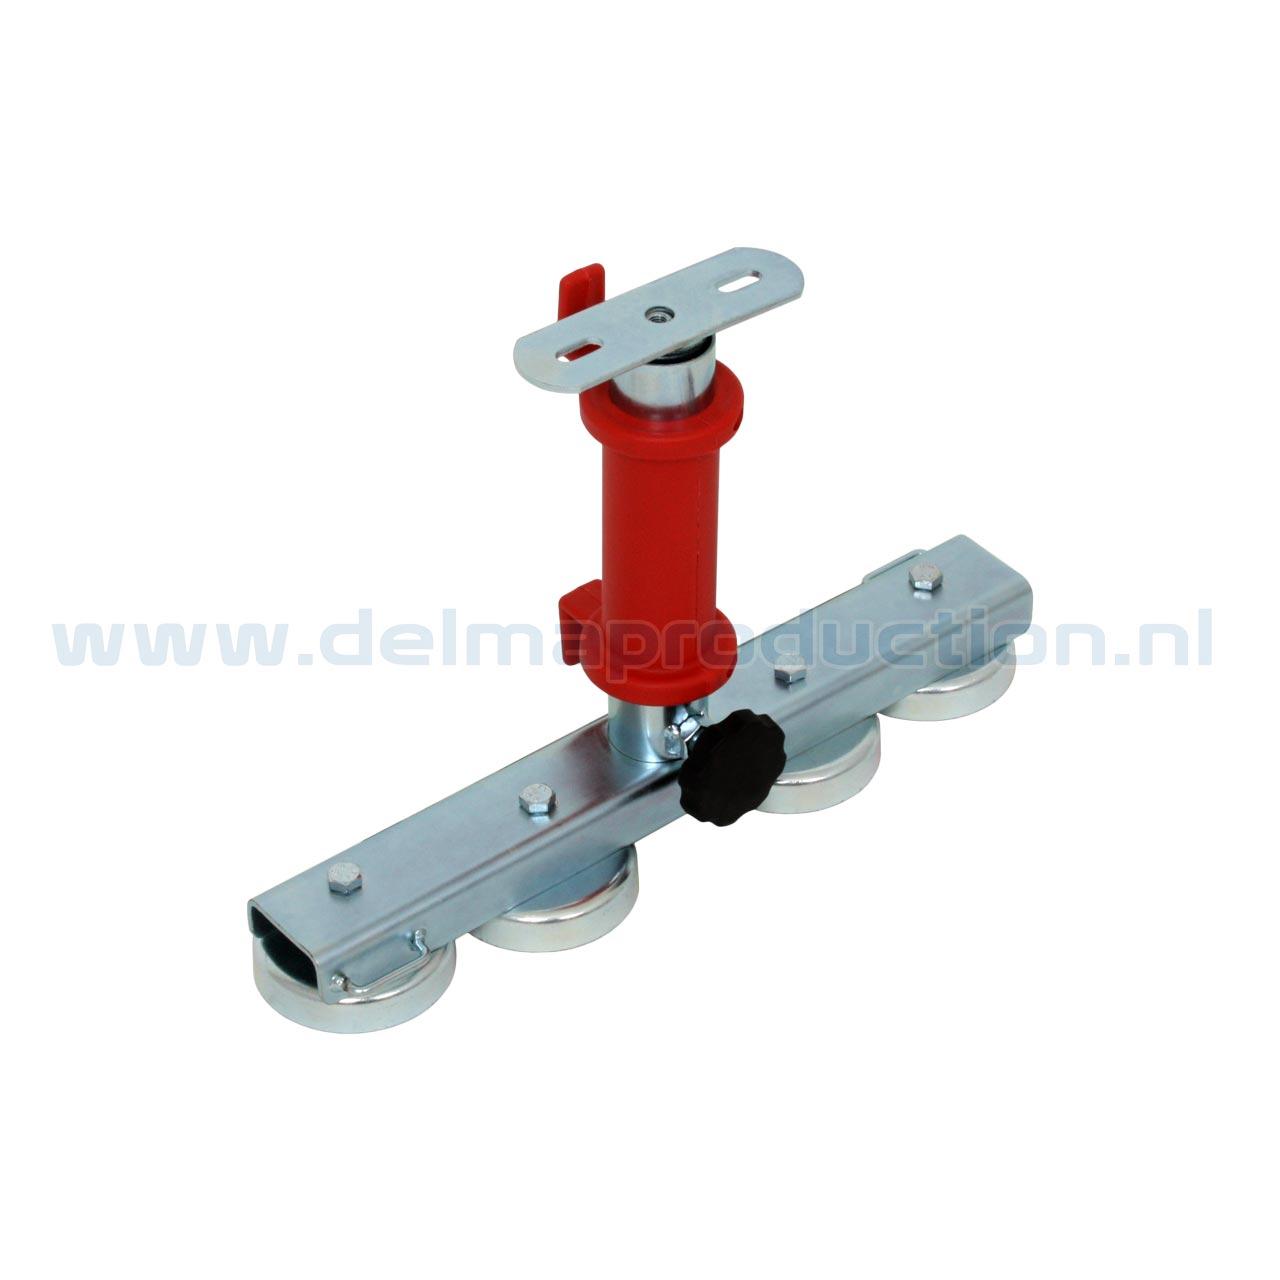 Magnet Stander mit 4 Magnete  (1)